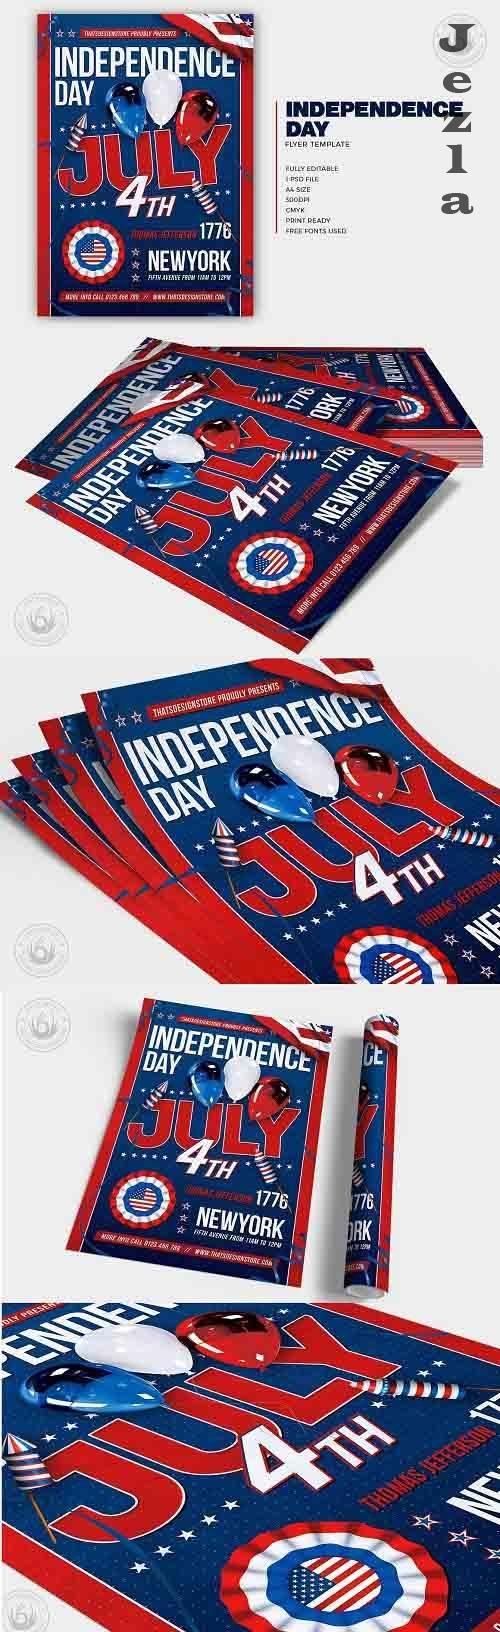 Independence Day Flyer Template V6 - 6156619